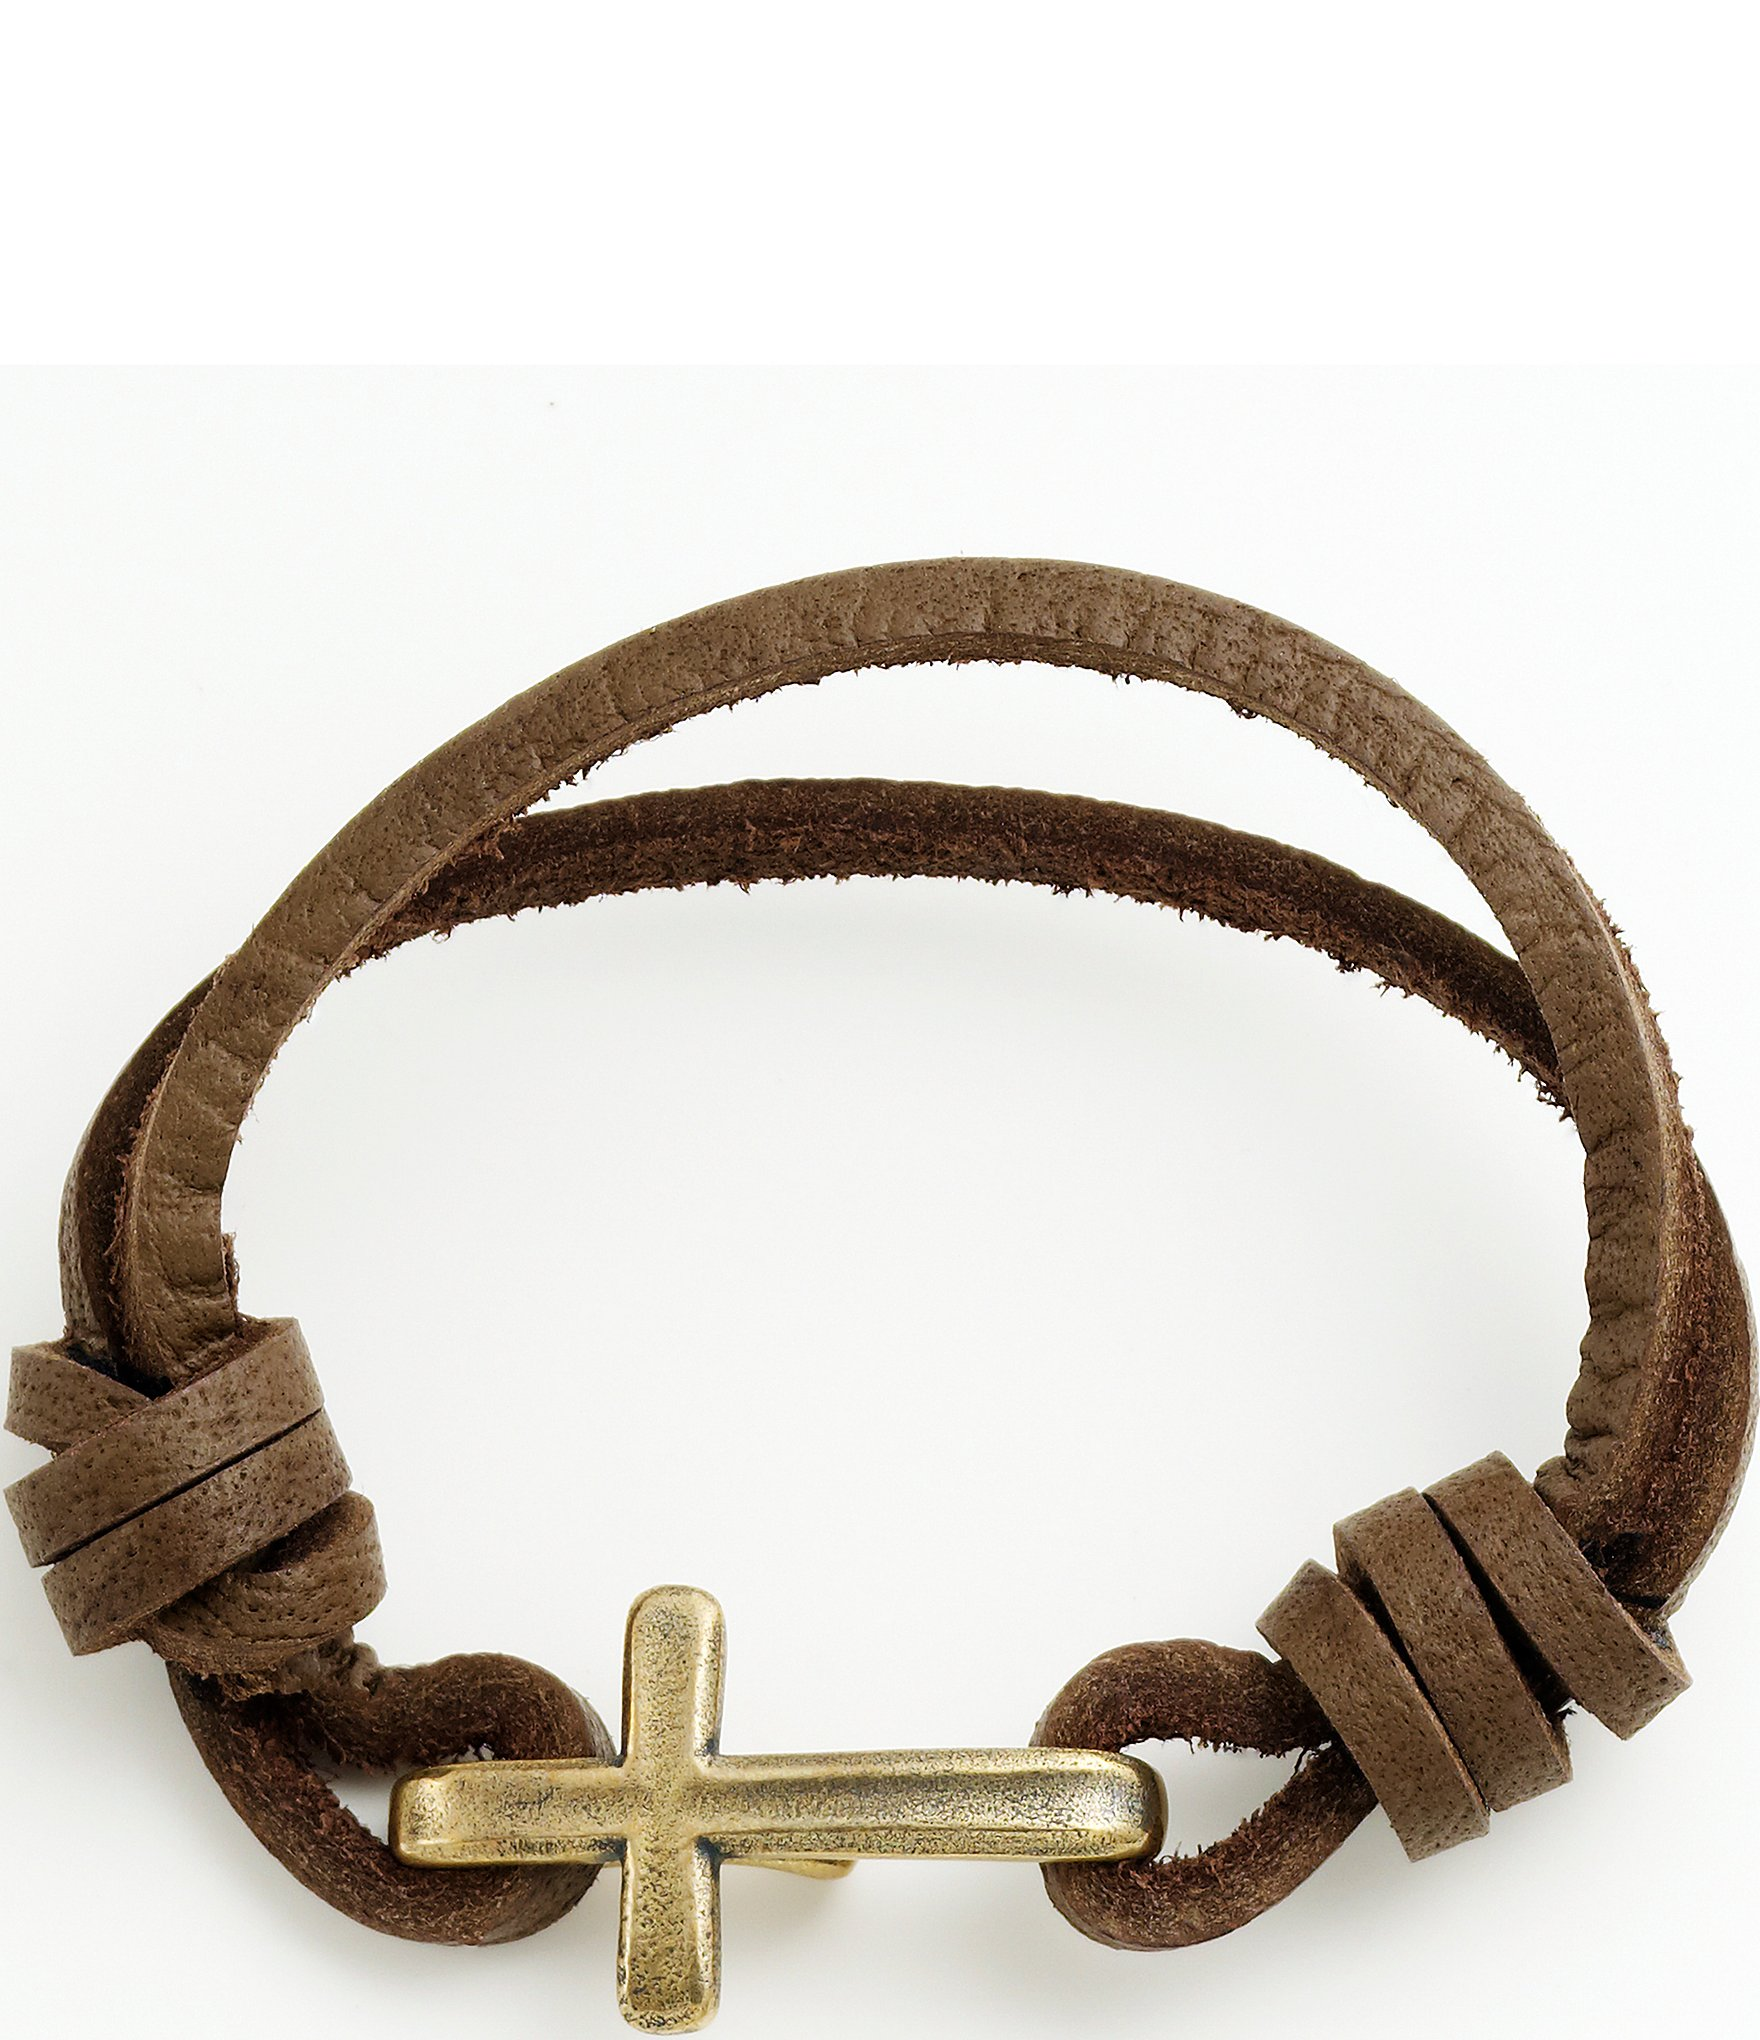 James Avery Bronze Cross Hook On Leather Bracelet Dillard S